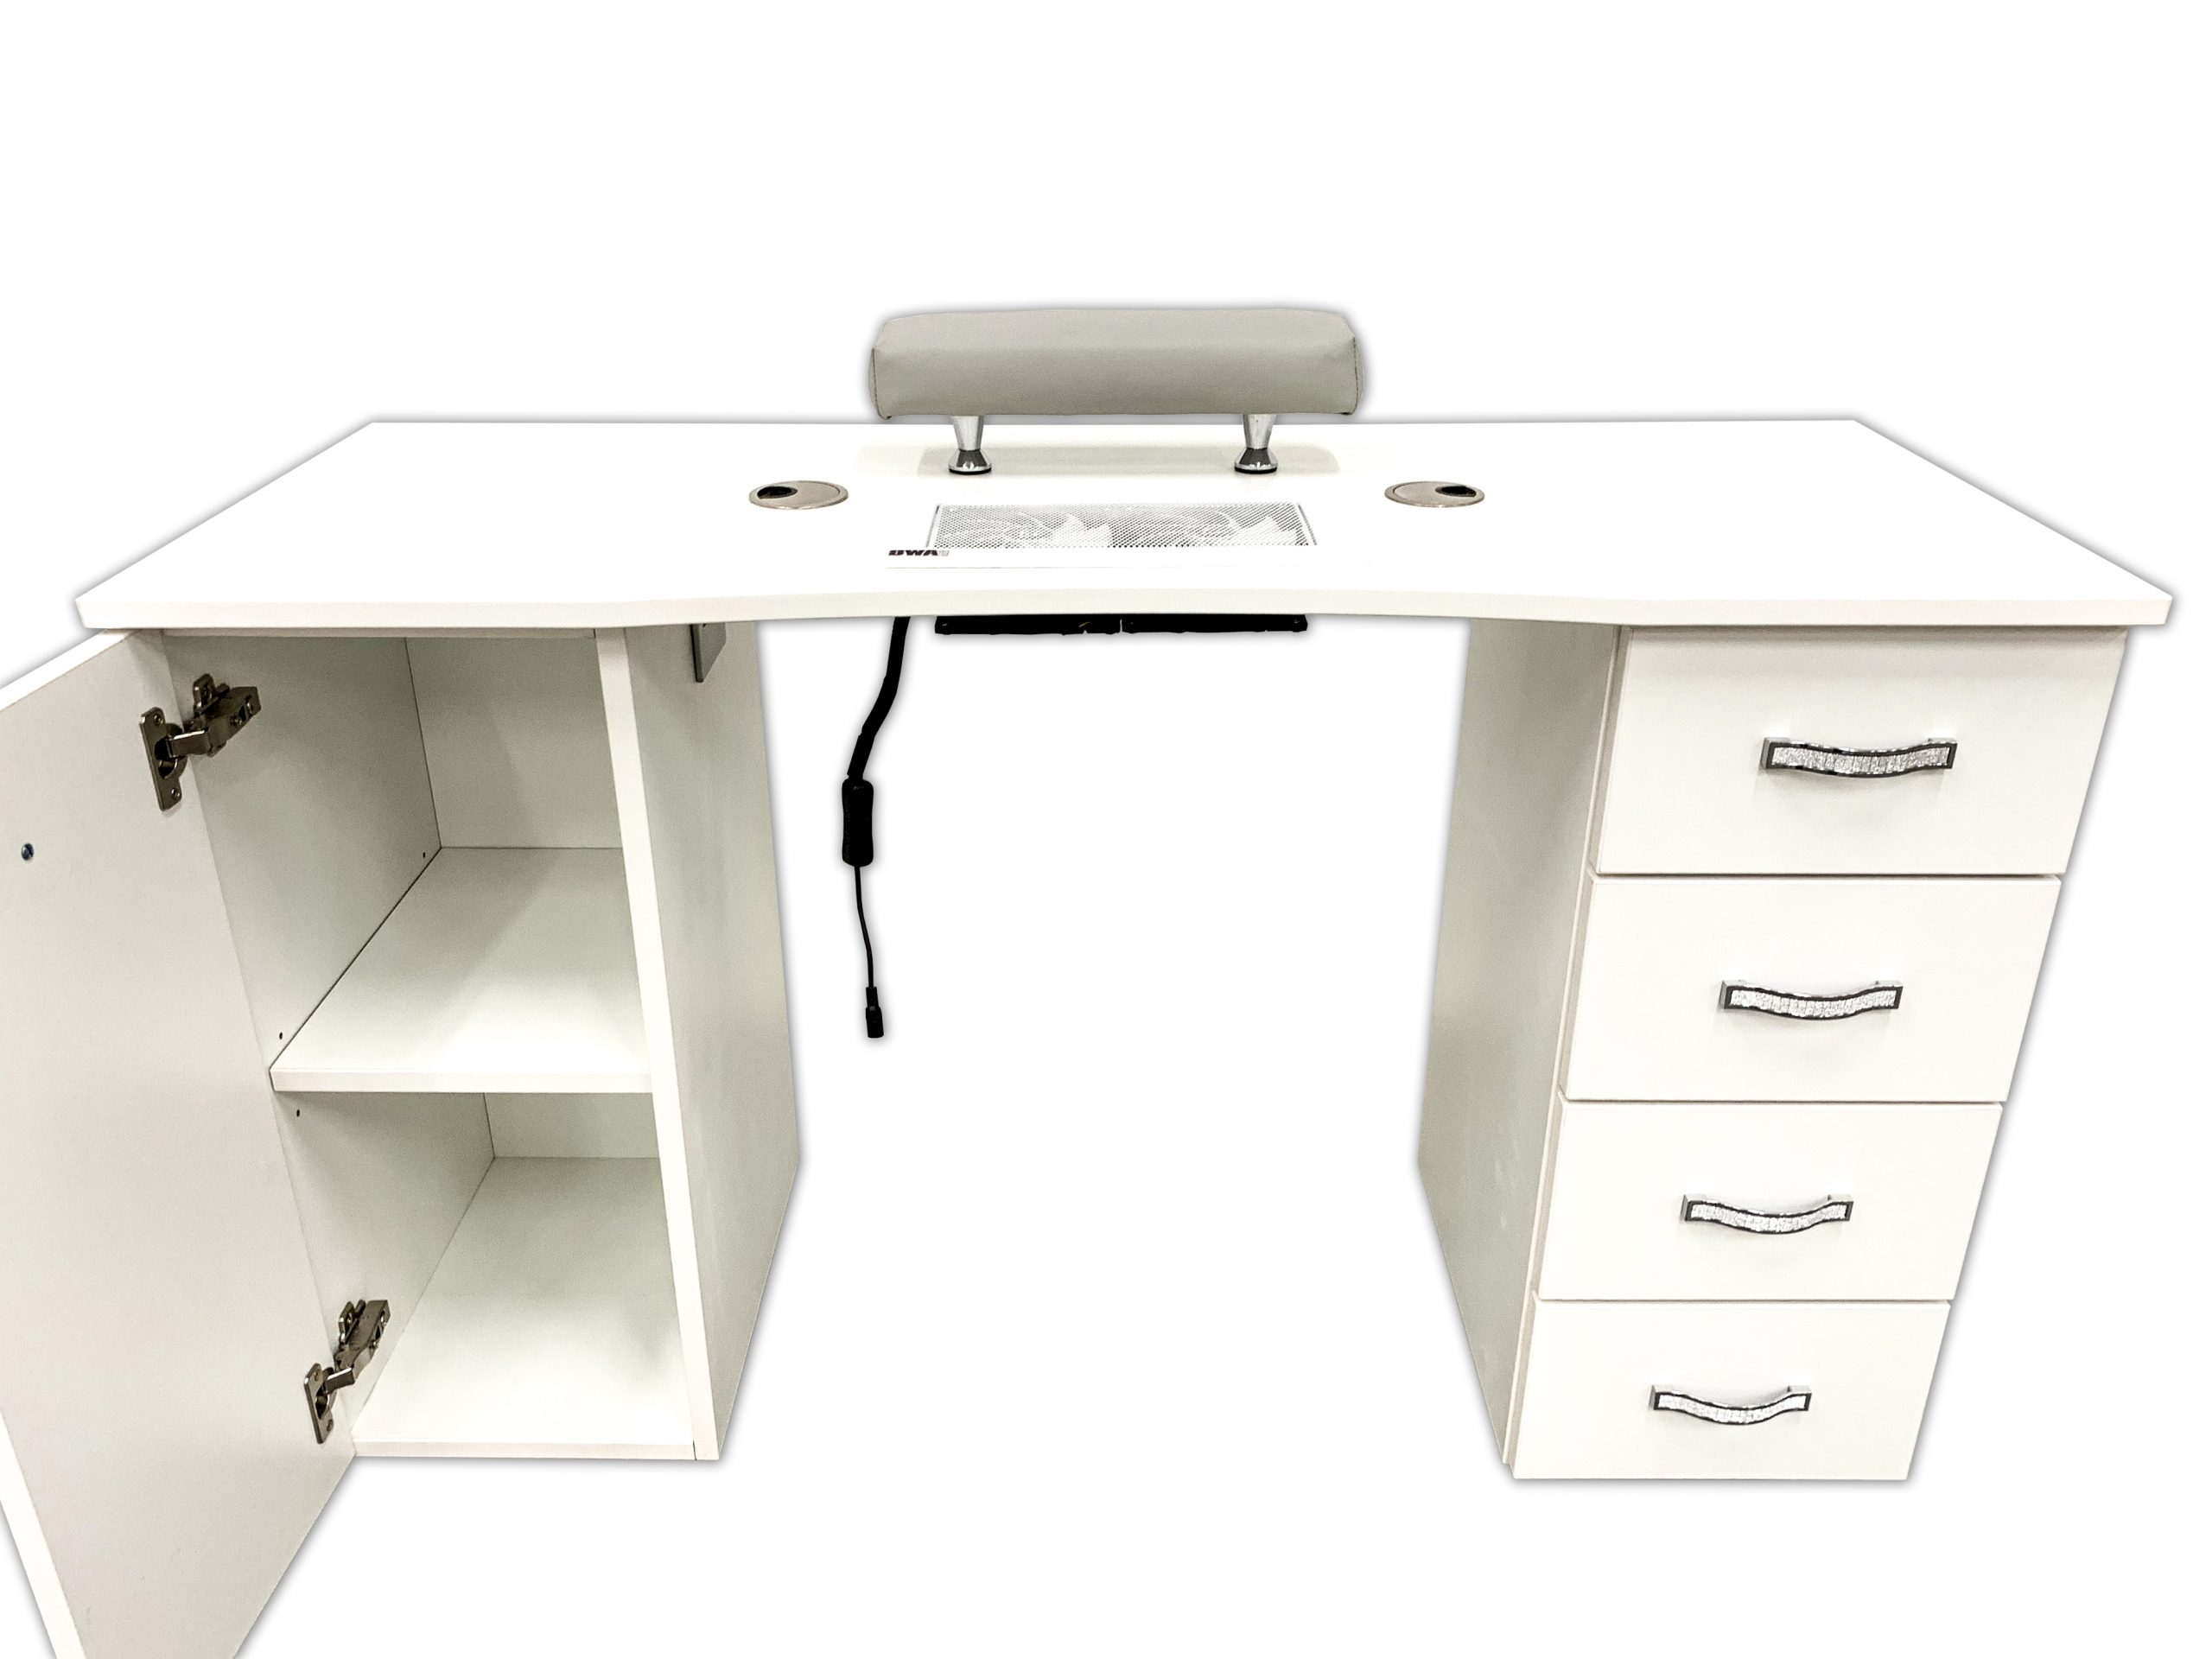 Manikérsky stôl MINI